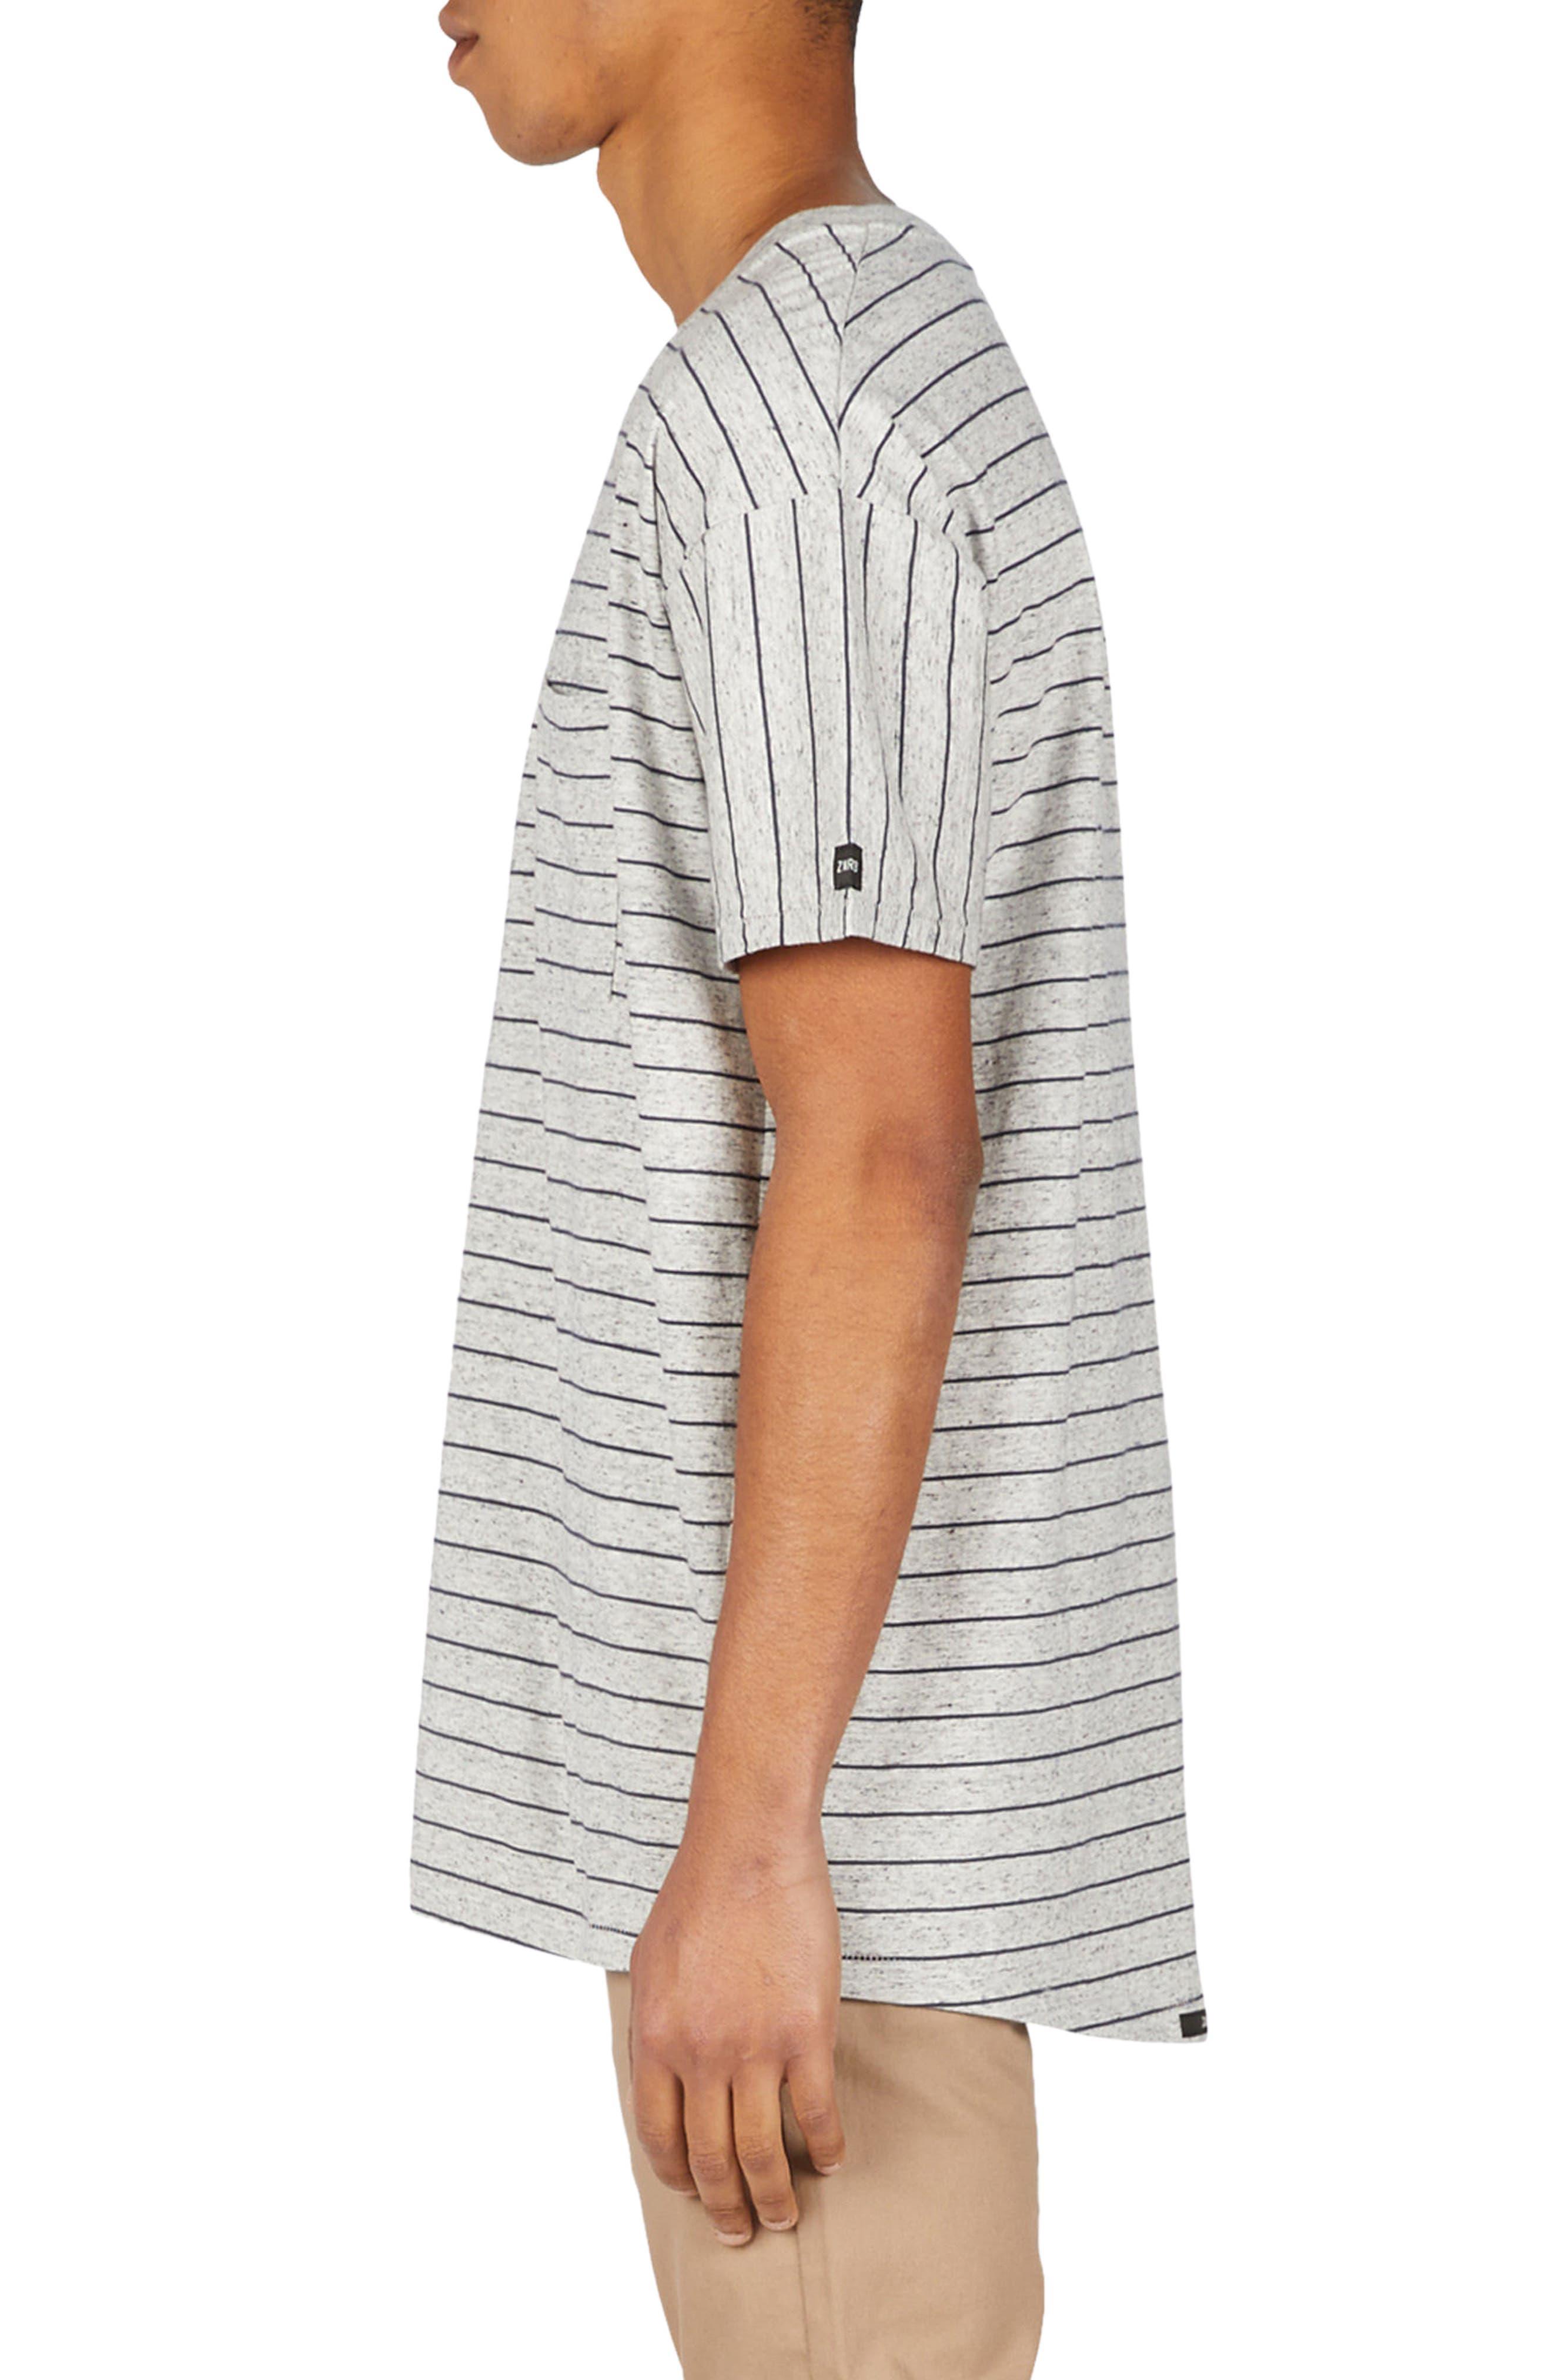 ZANEROBE,                             Stripe Rugger T-Shirt,                             Alternate thumbnail 3, color,                             050